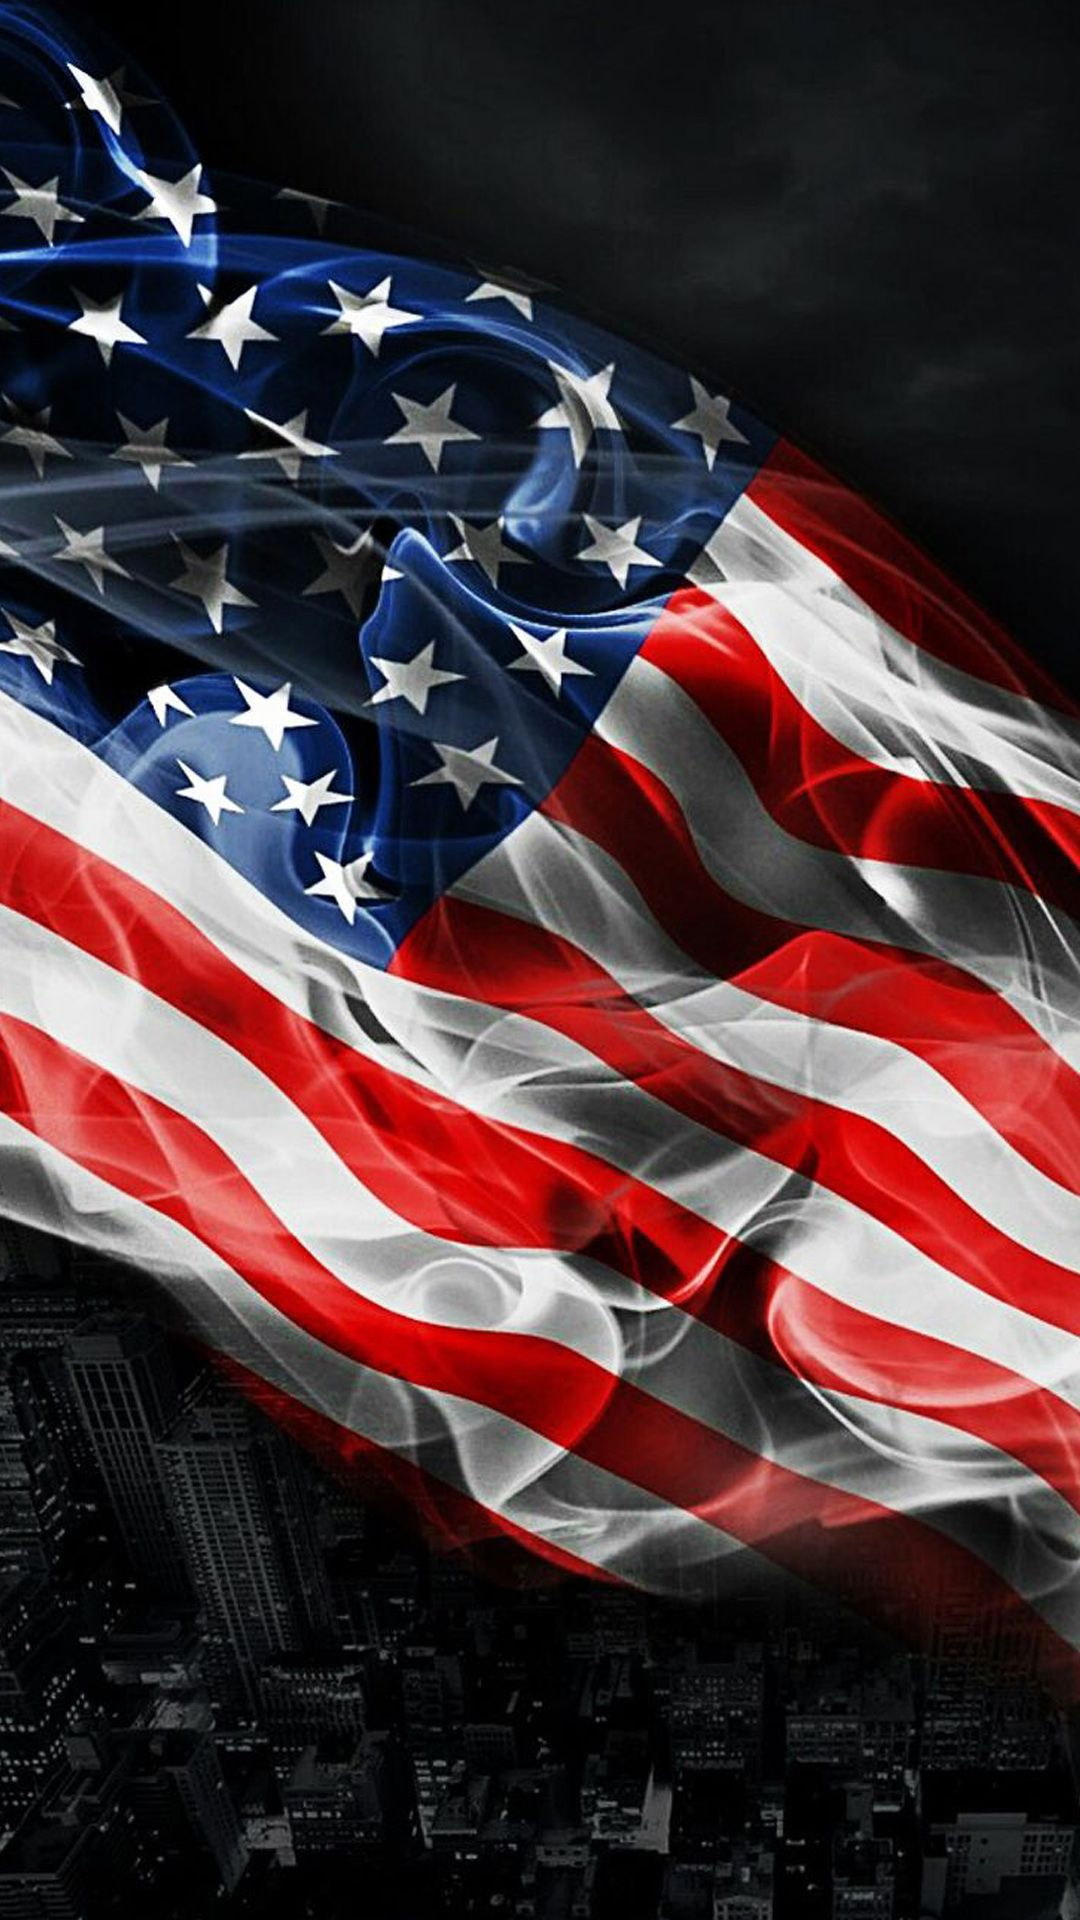 Hd wallpaper usa flag - American Flag Screensavers And Wallpaper